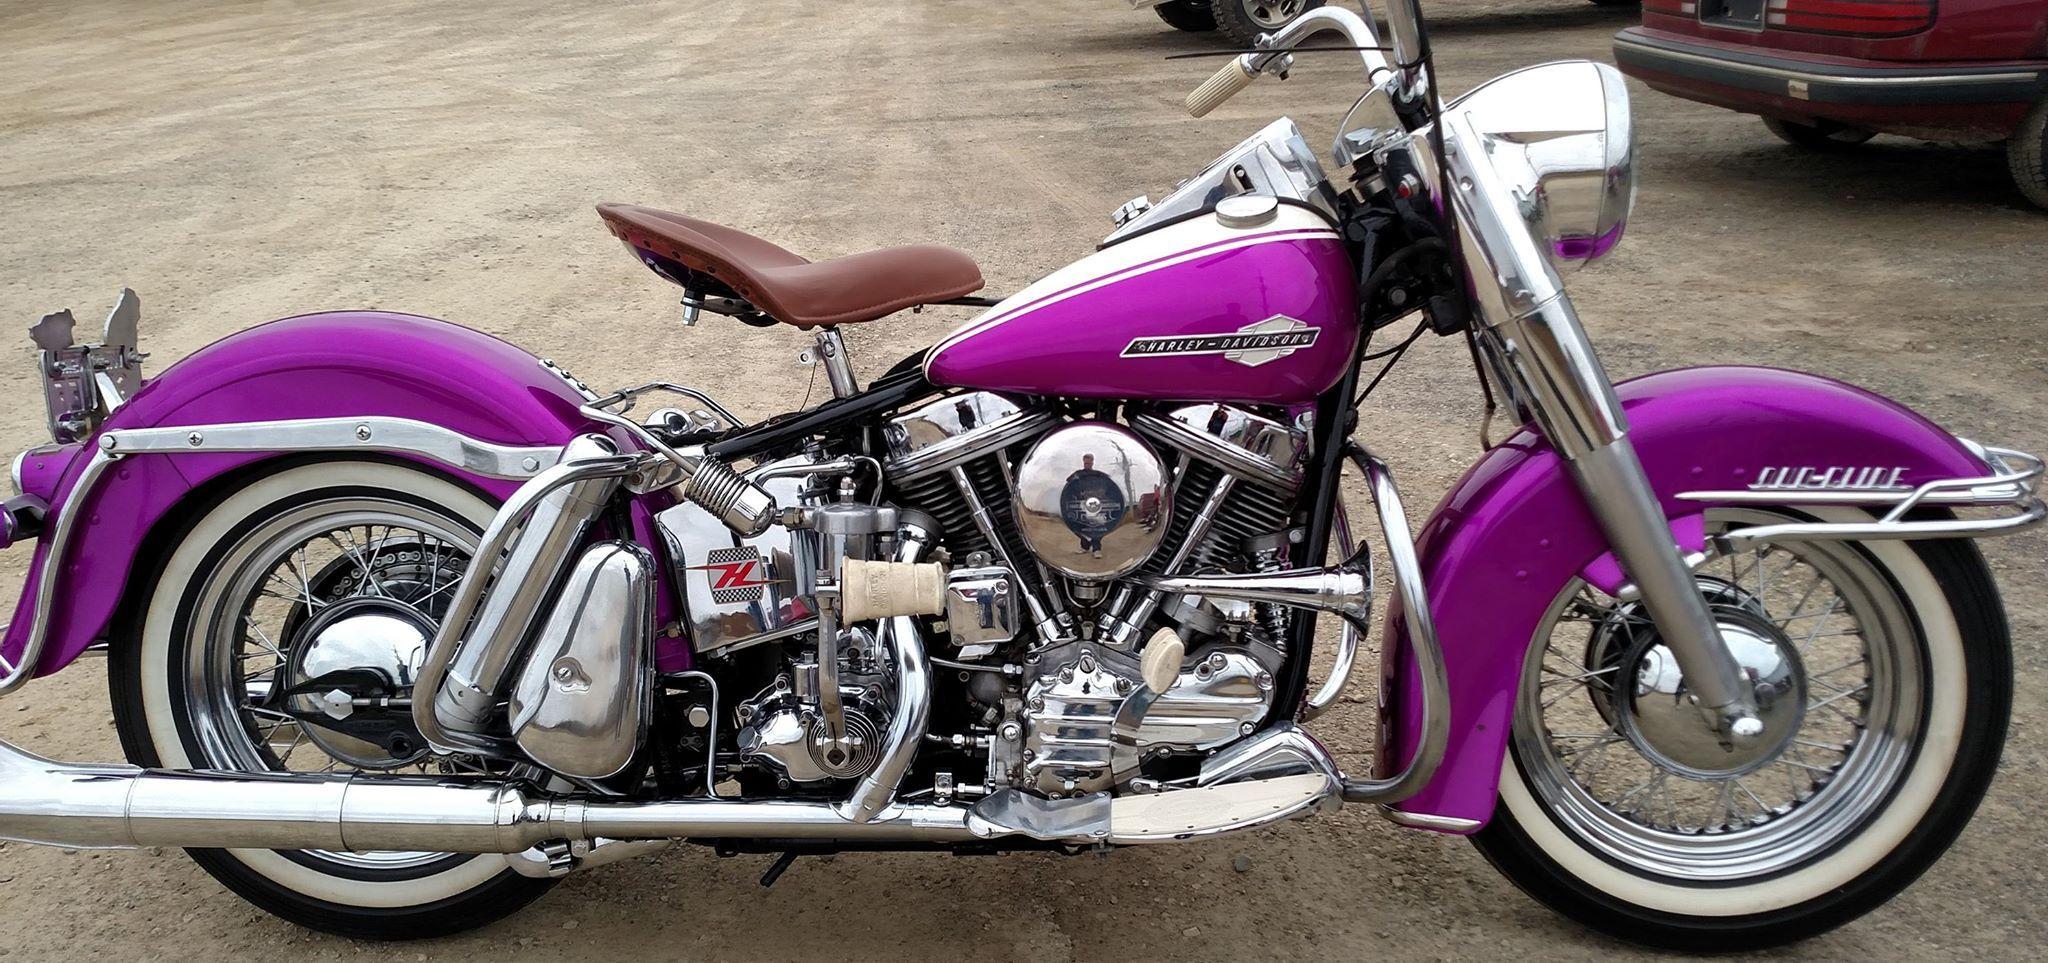 Duo Glide Panhead 1963 Harley Bikes Harley Davidson Panhead Harley Davidson Motorcycles